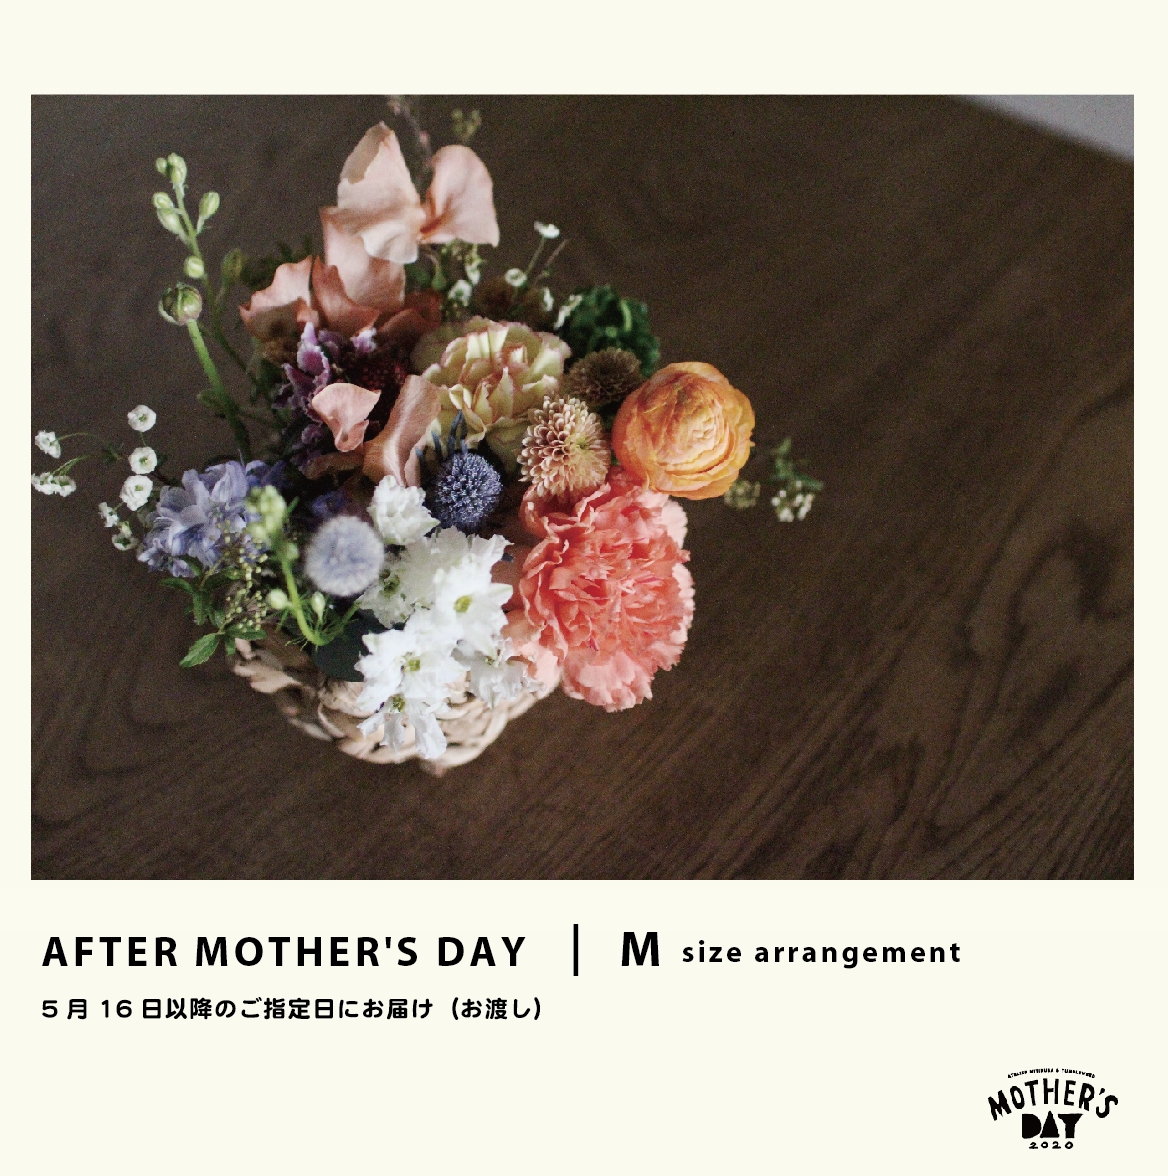 【AFTER MOTHER'S DAY】 NO.1.1 -FLOWER ARRANGE(M-size)